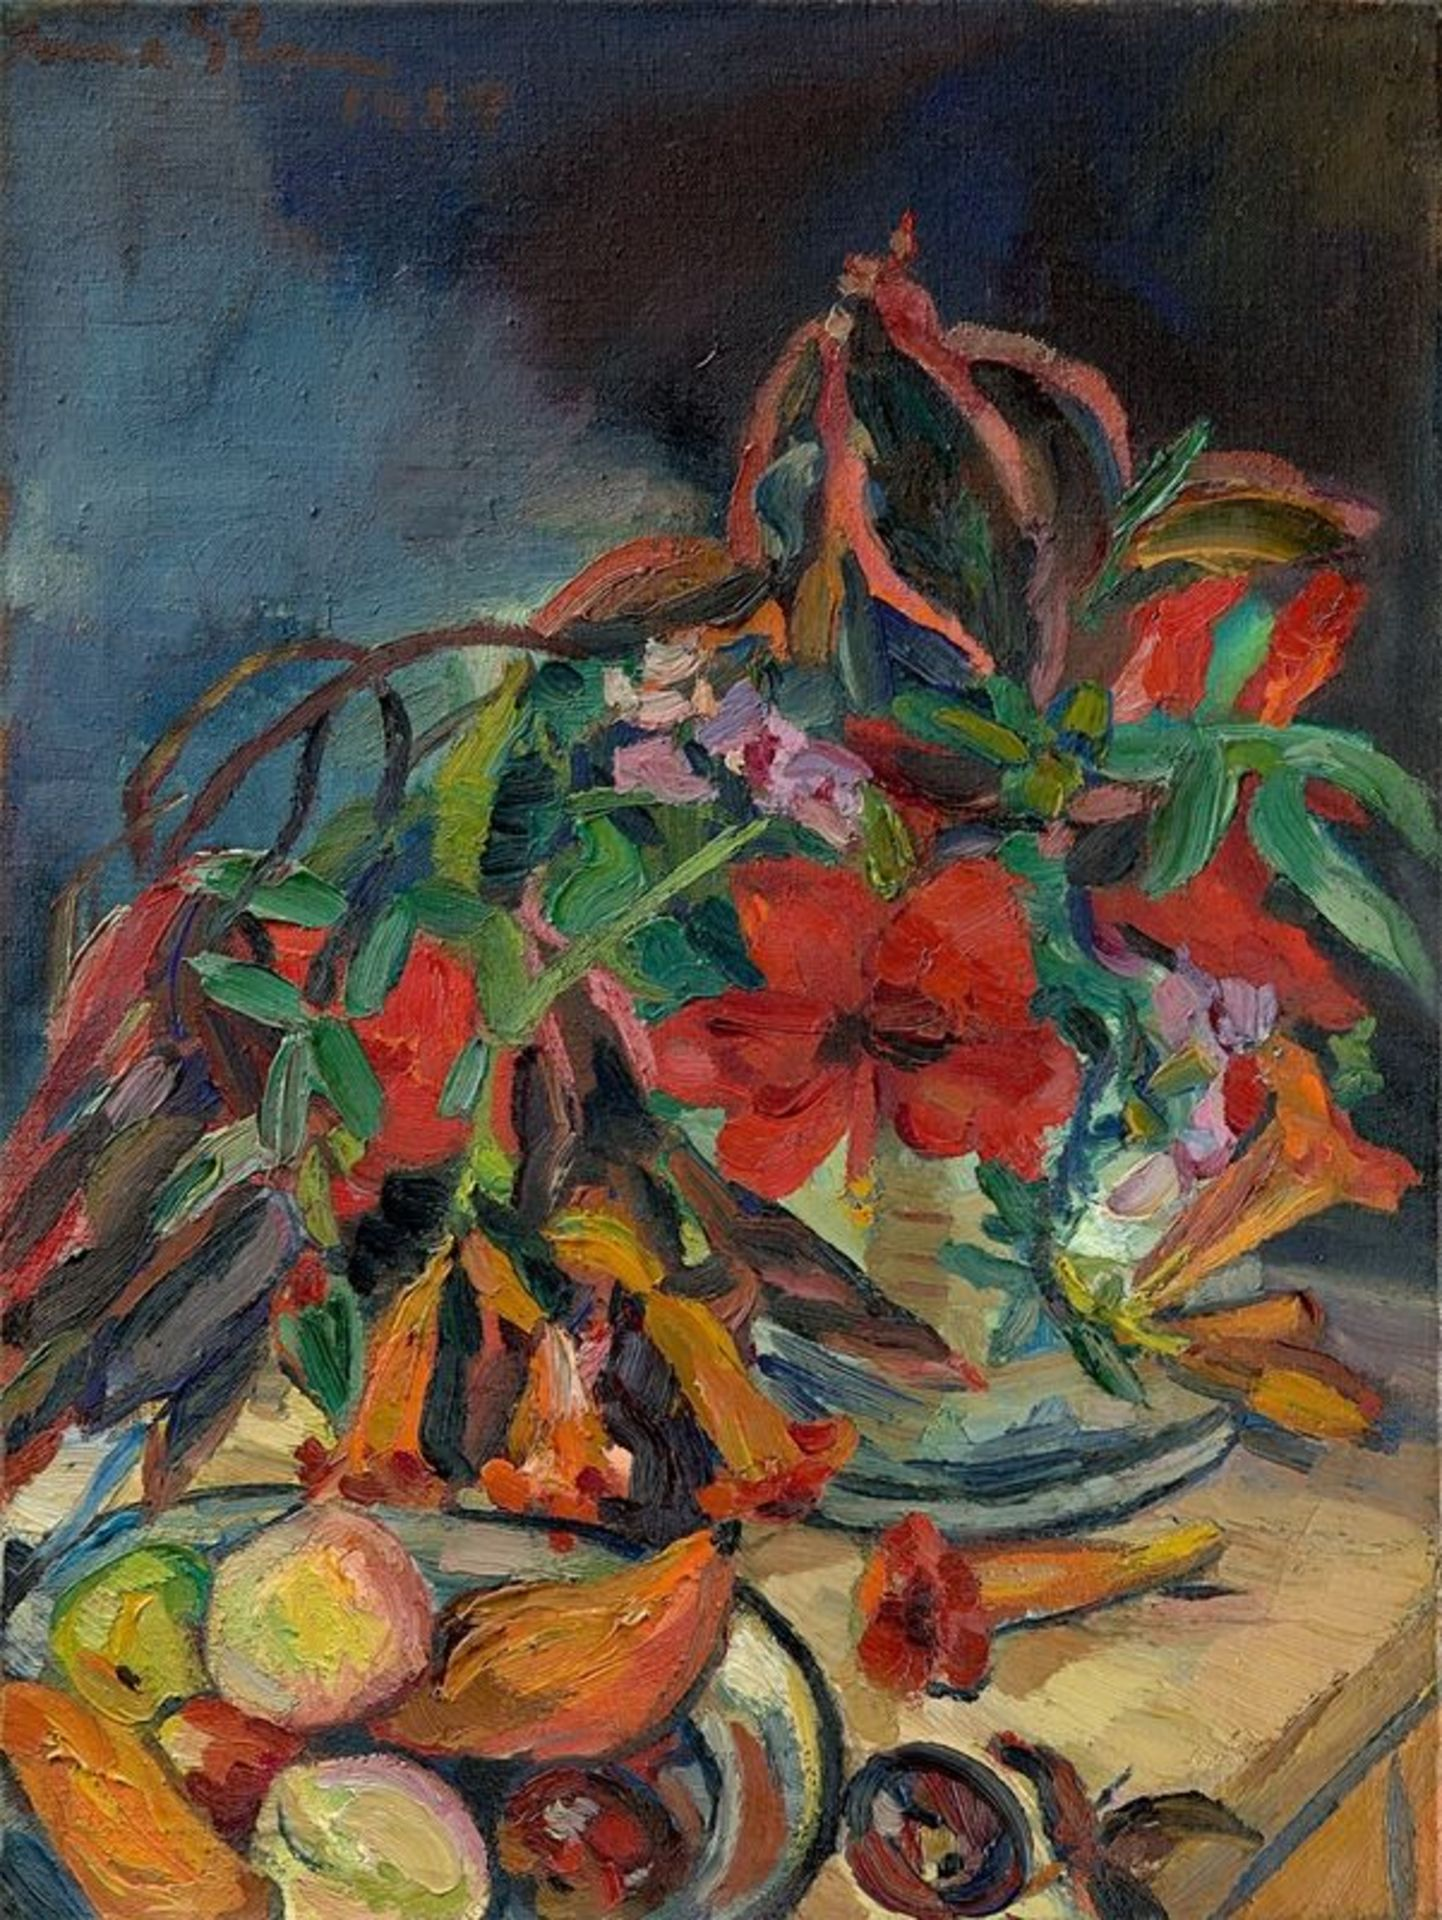 Los 207 - Irma Stern (Schweizer-Reneke (Südafrika) 1894 – 1966 Kapstadt)